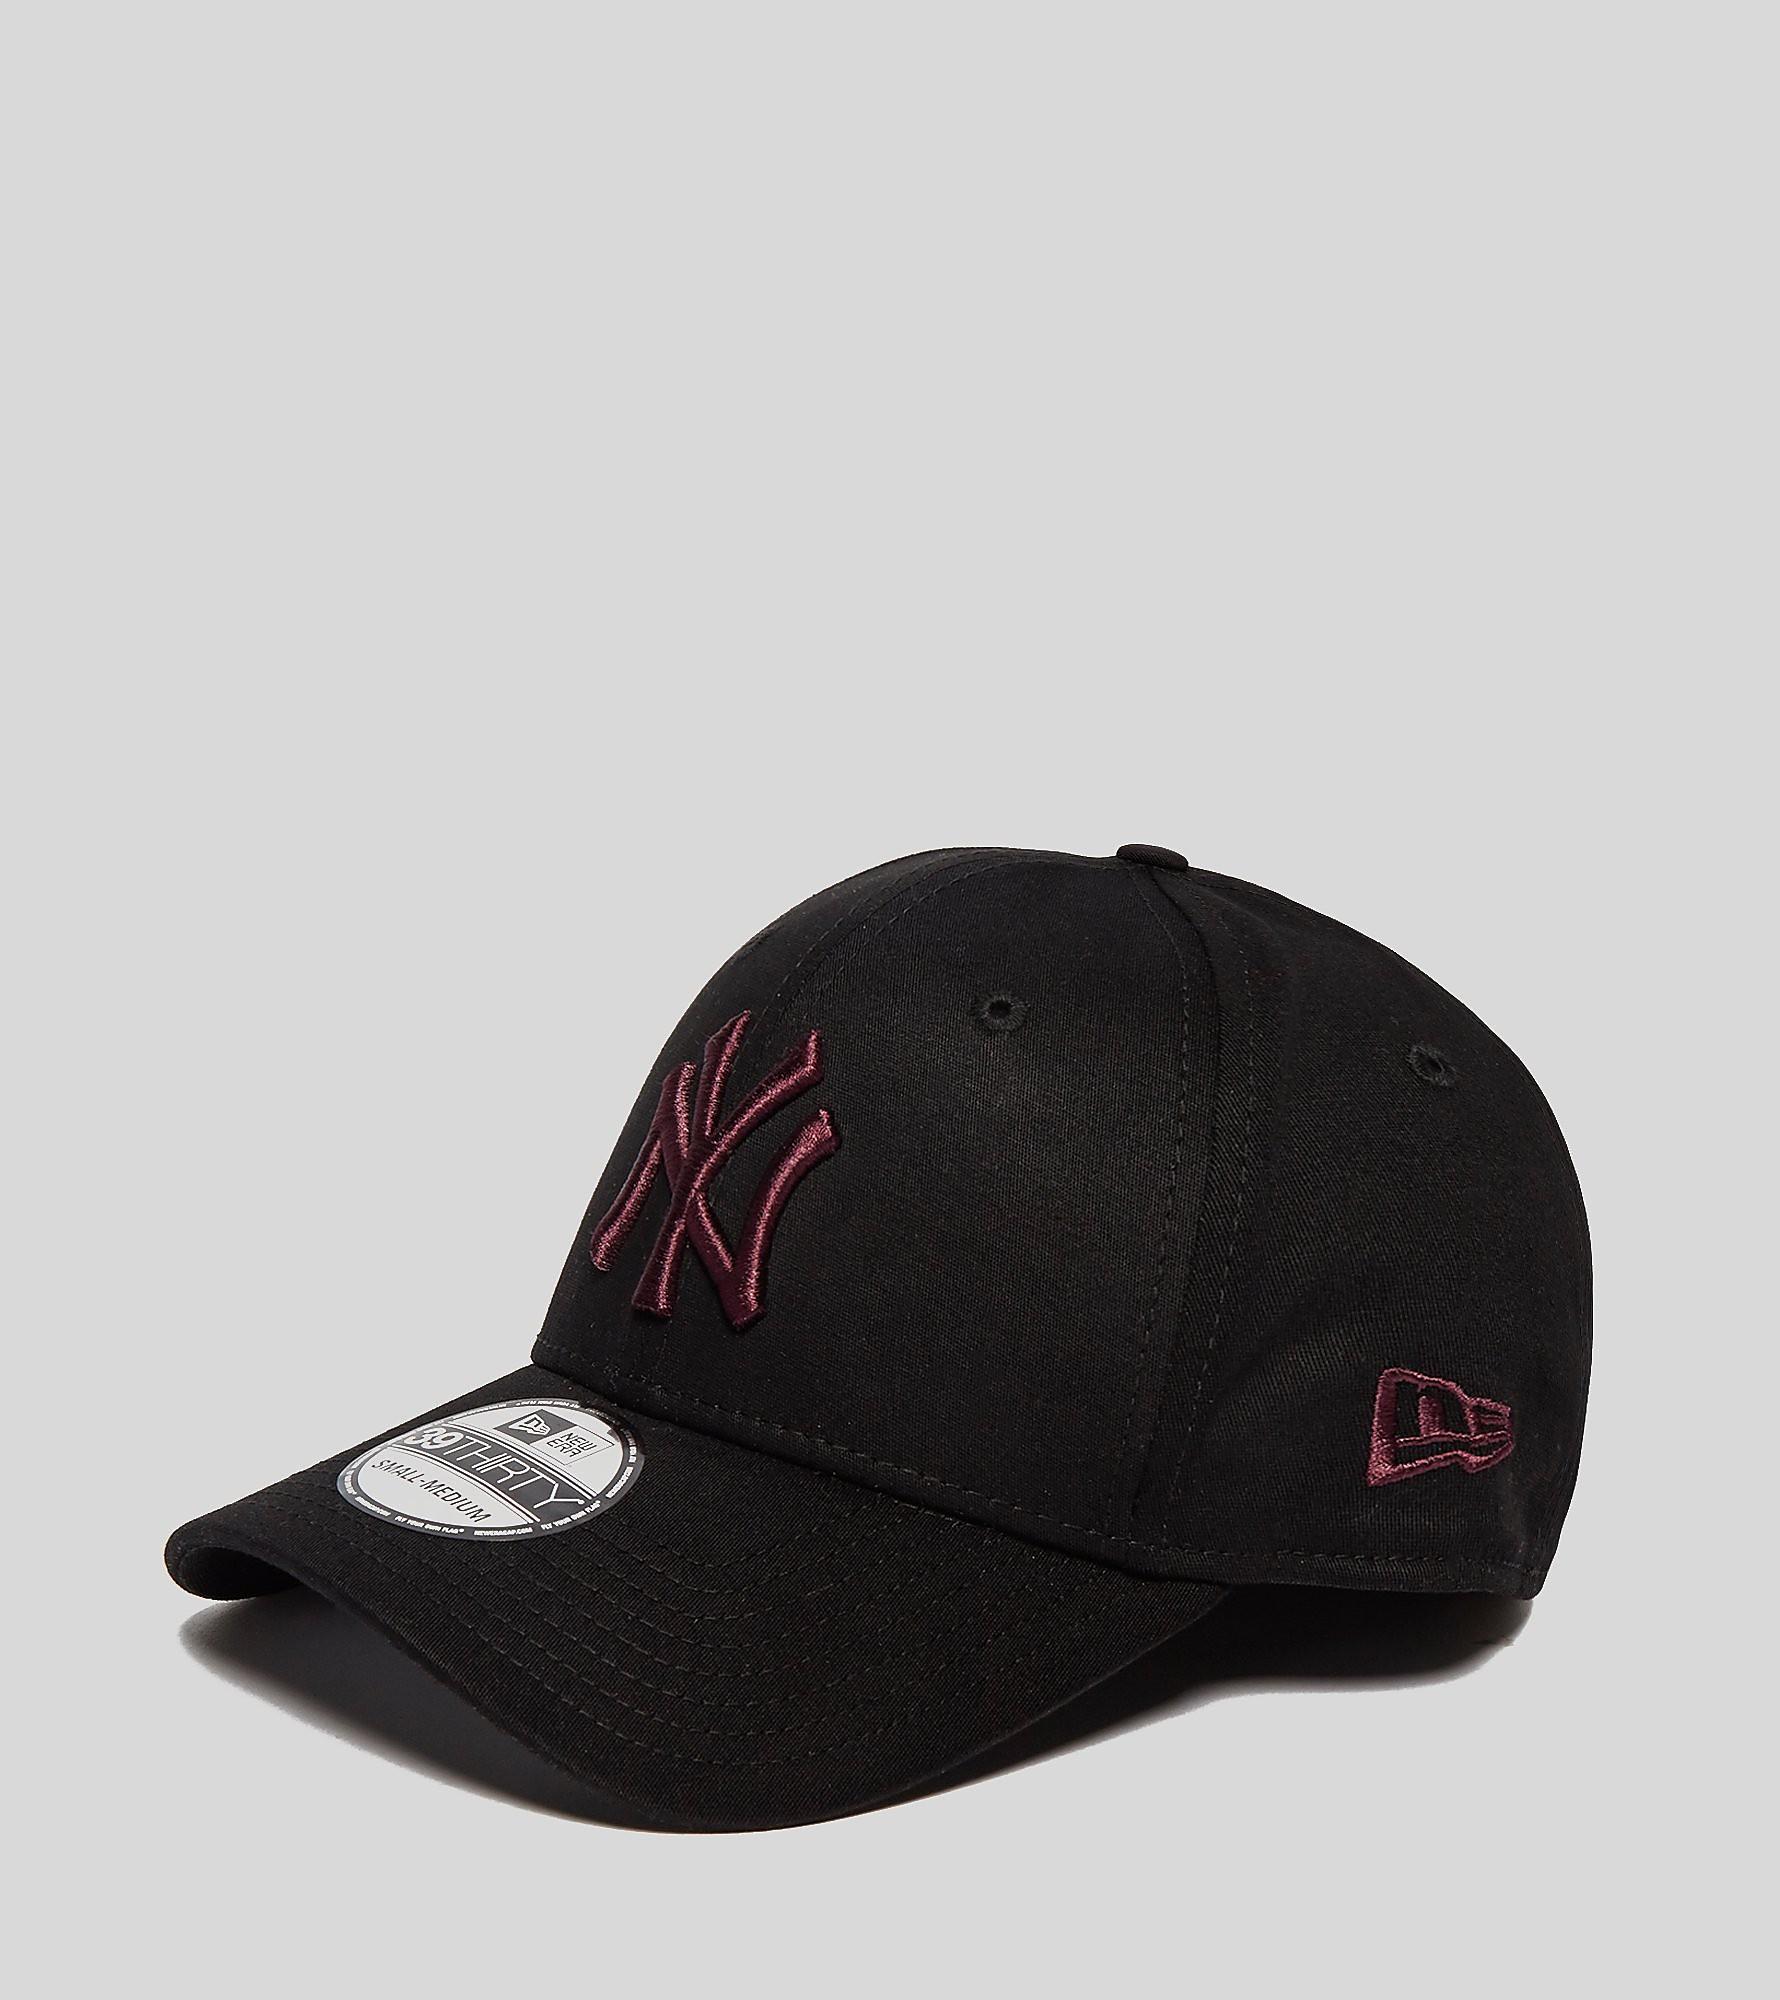 New Era 39THIRTY NY Fitted Cap